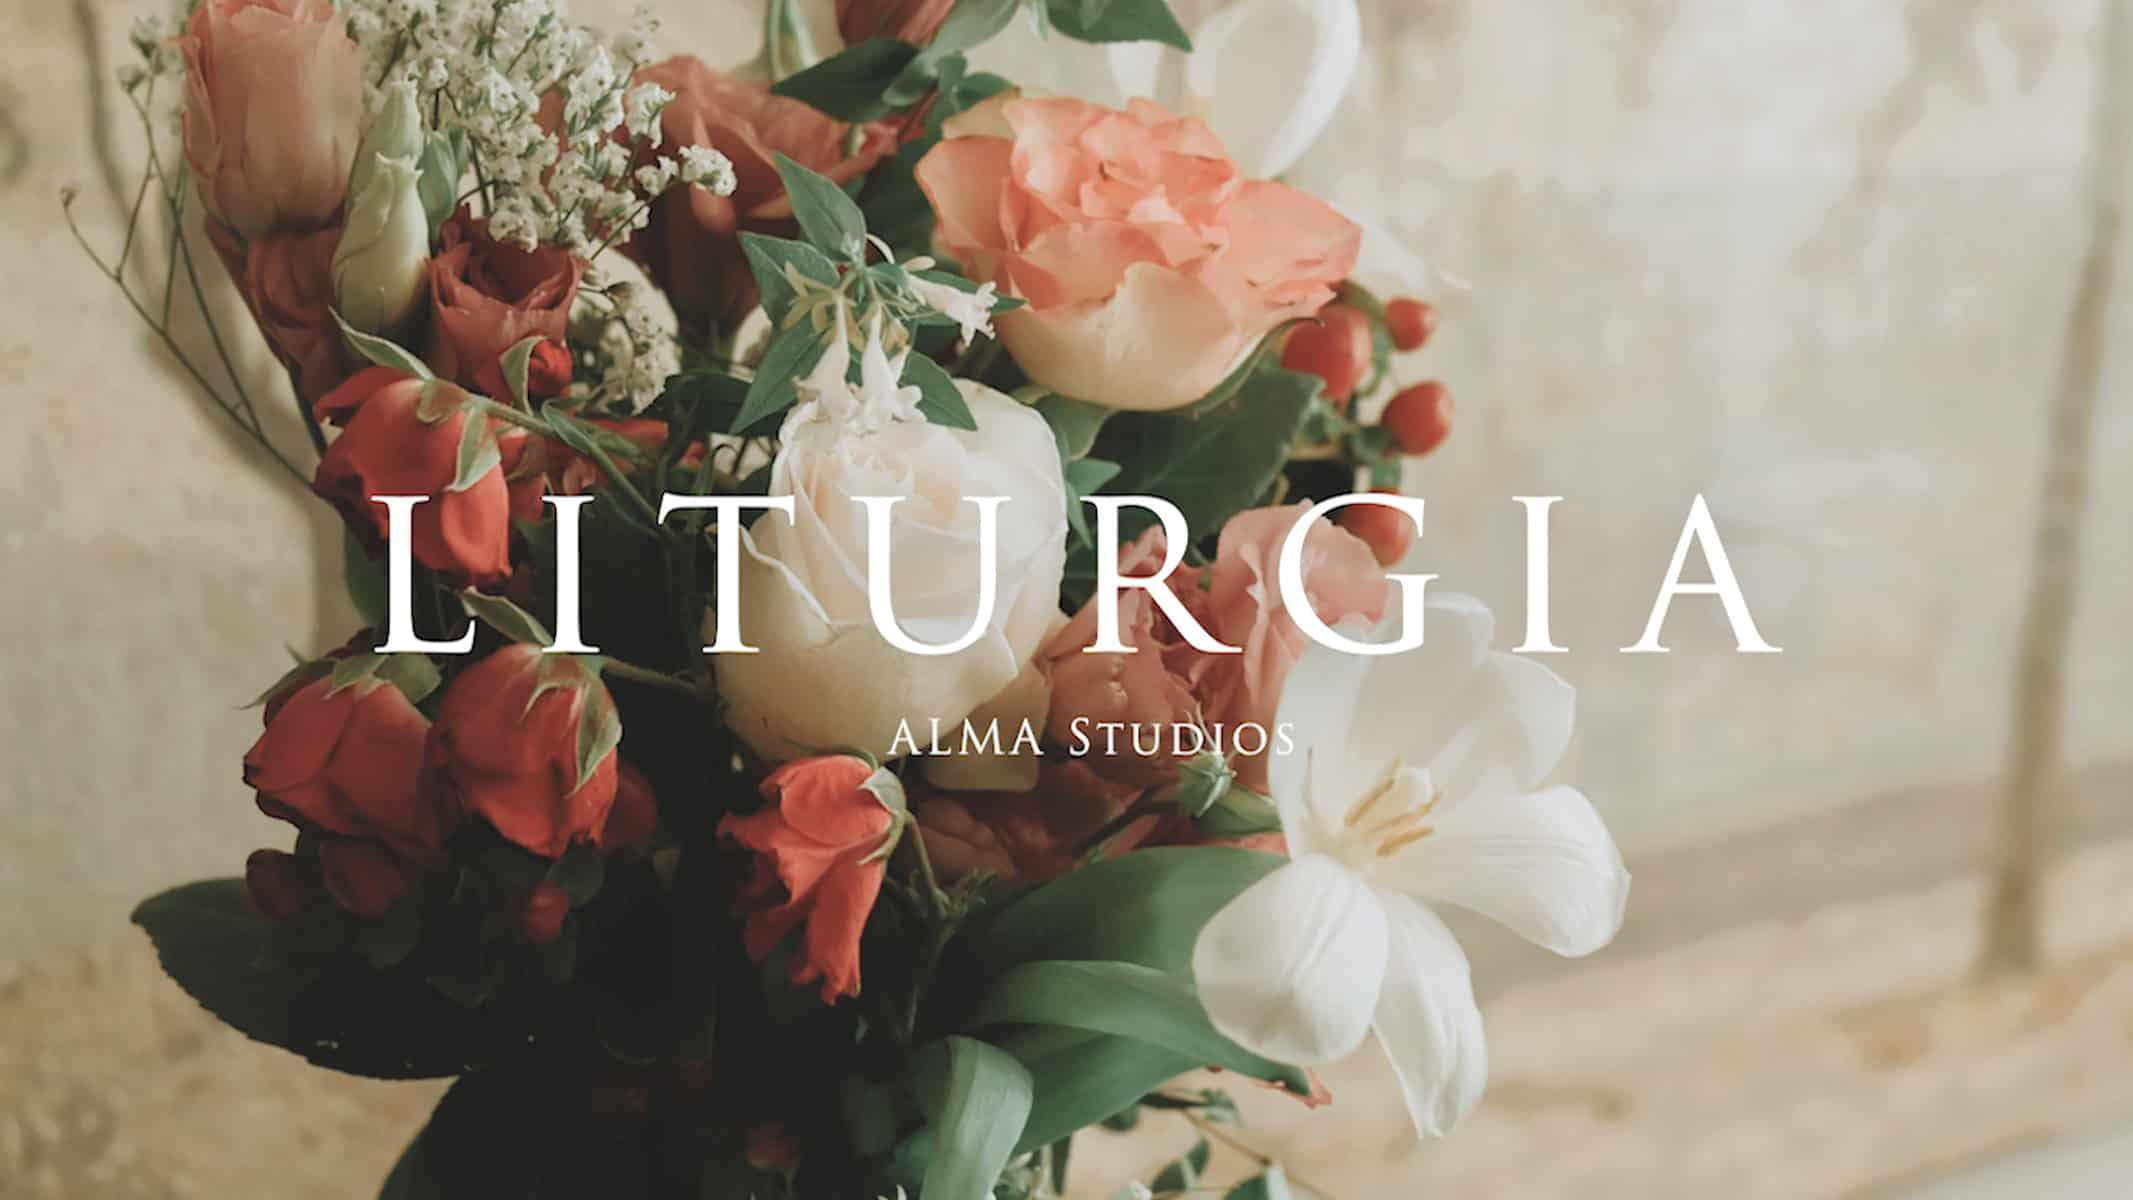 Peliculas de Alma Studios. Liturgia. Wedding Film